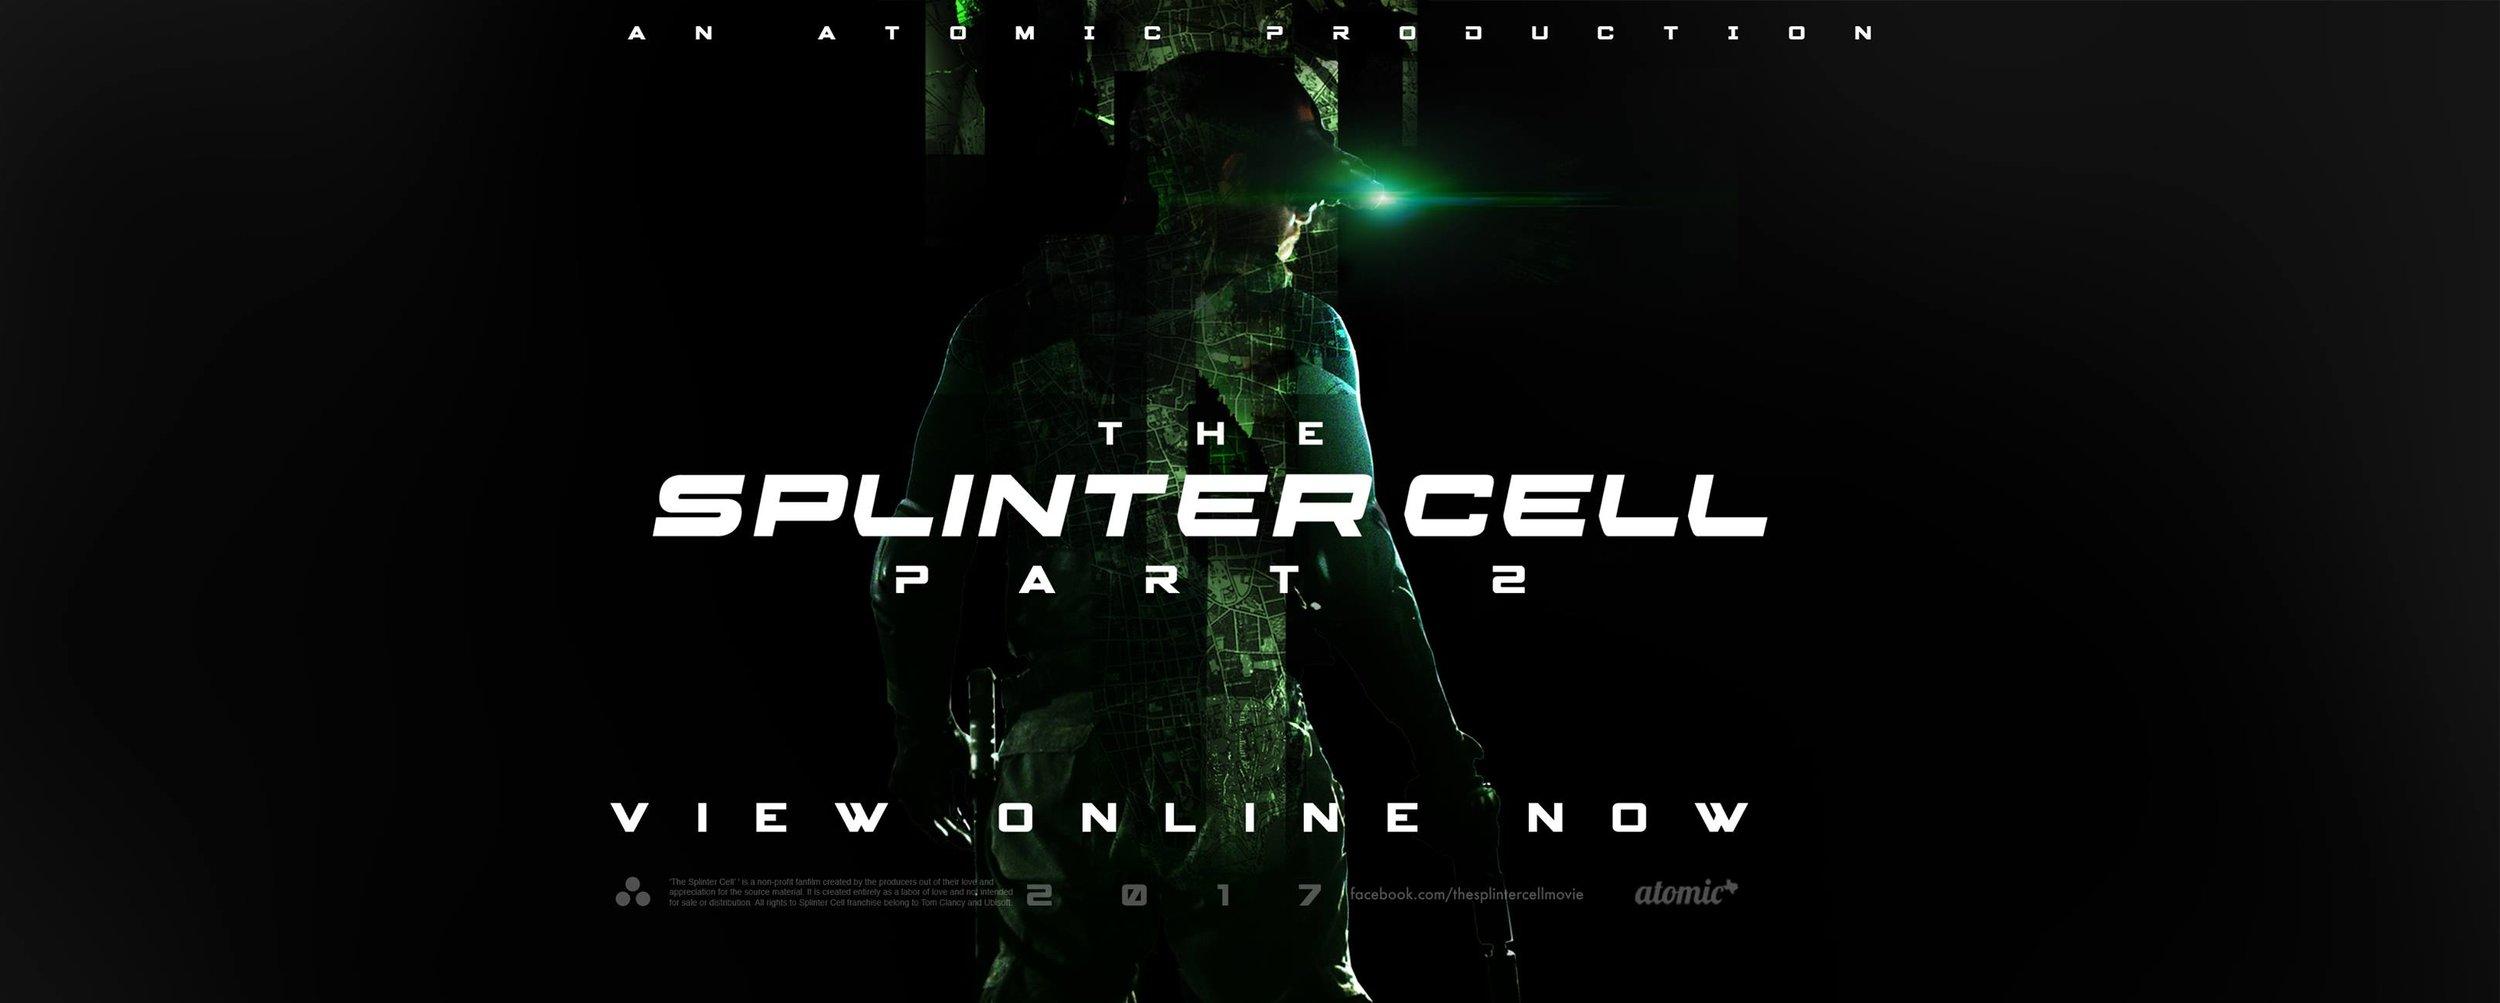 the-splinter-cell-part-2.jpg